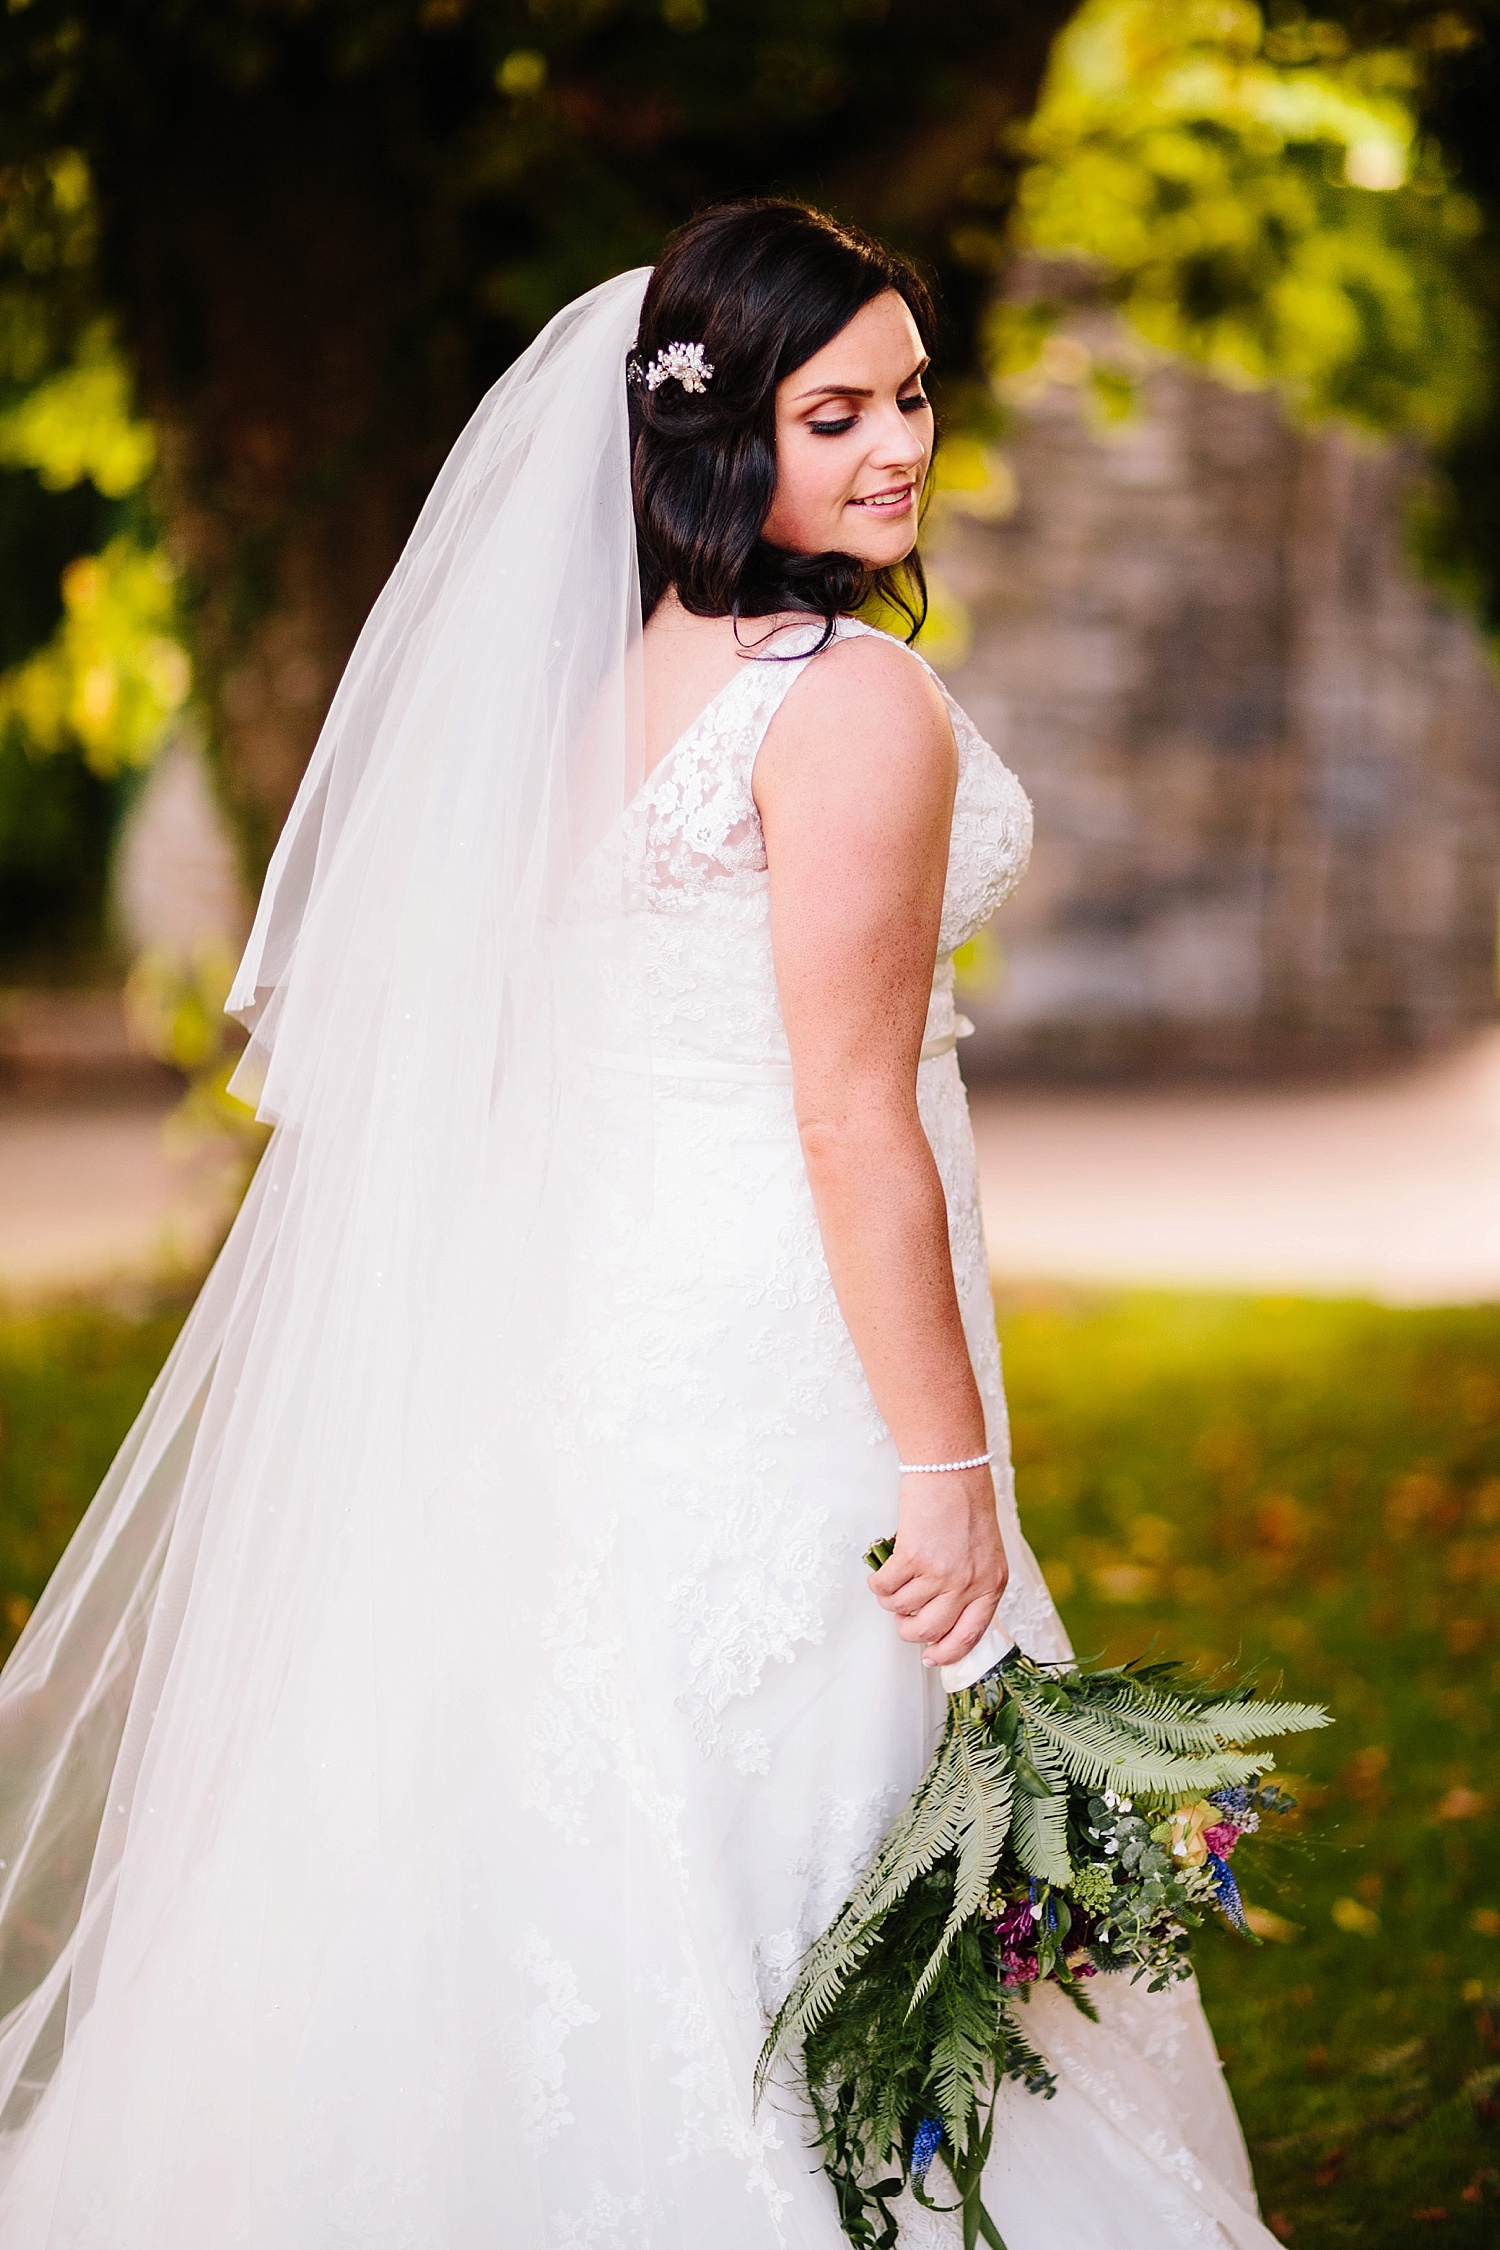 castle_dargan_wedding-fermanagh_wedding_photographer-ashford_castle_wedding-best_of_2016_sharon_kee_photography_0151